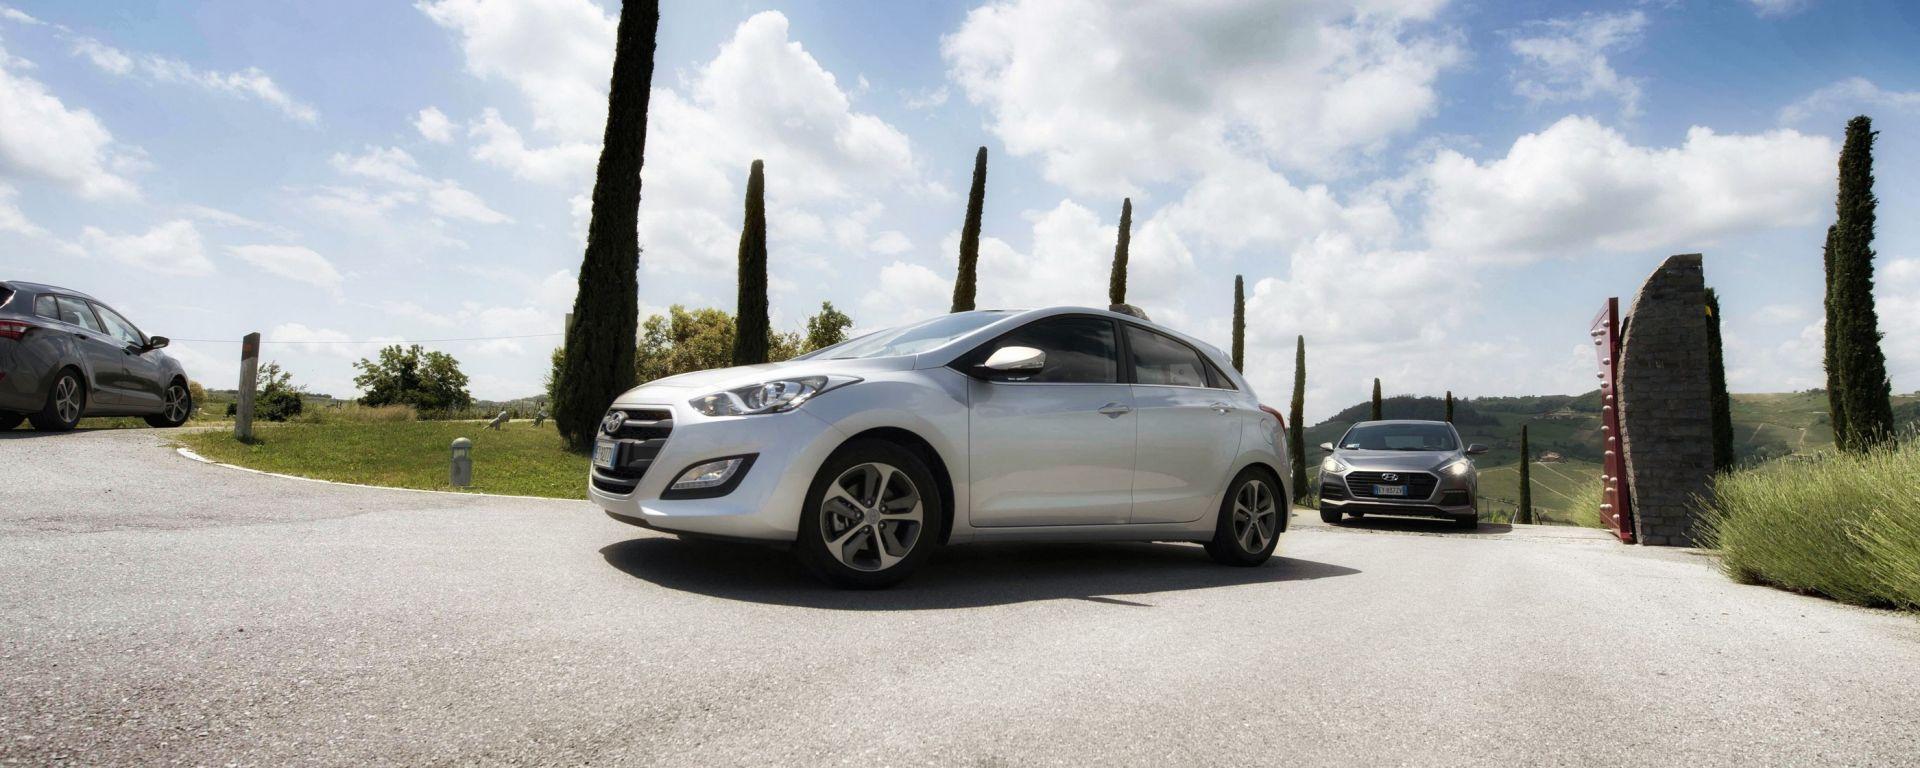 Hyundai i30 2015 e Hyundai i30 Turbo